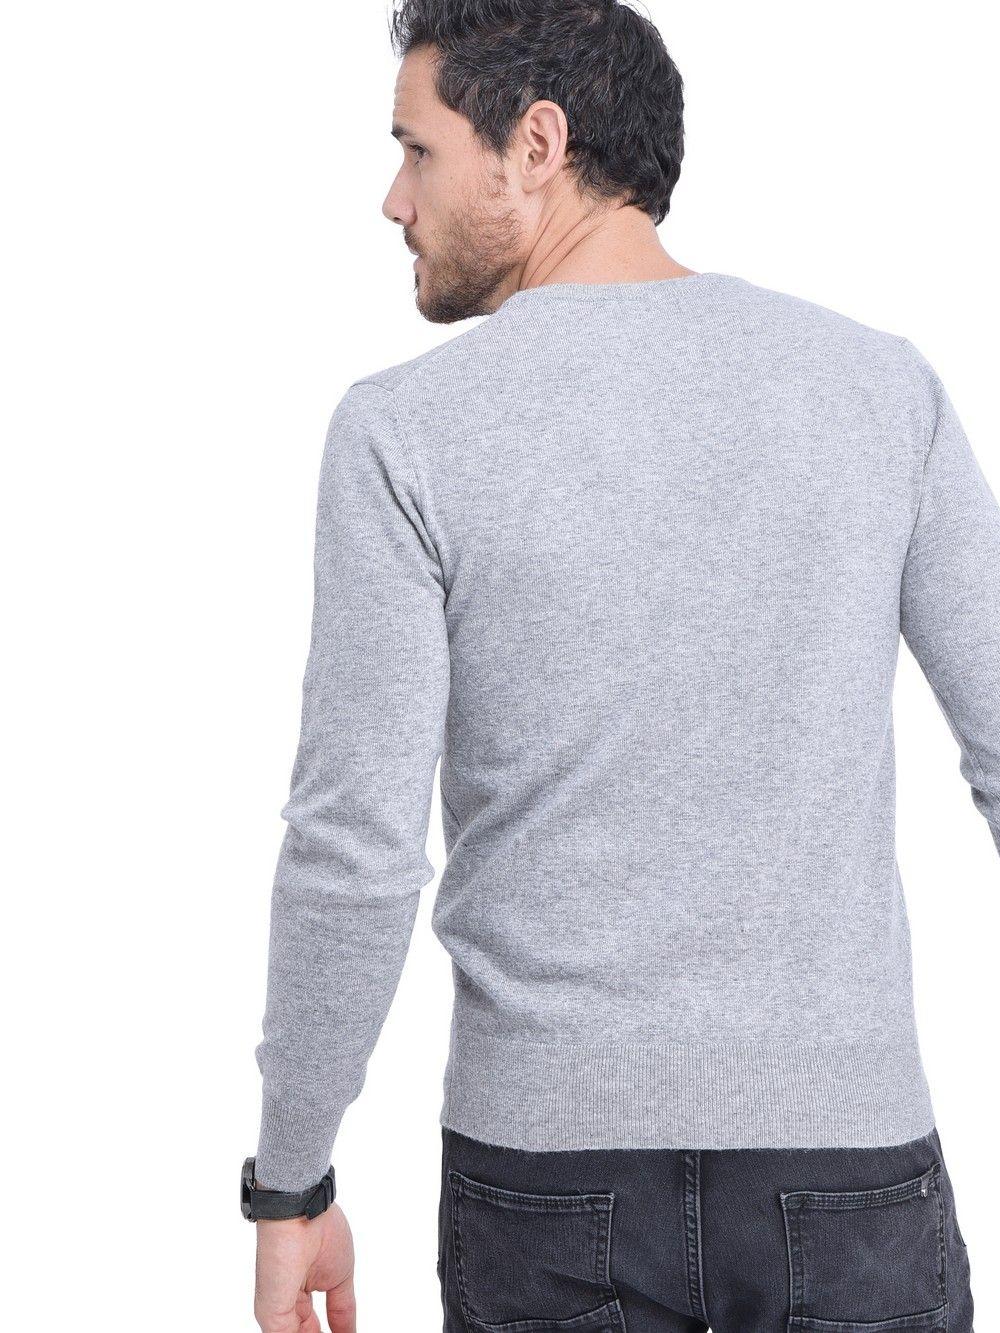 C&JO Round Neck Sweater in Light Grey